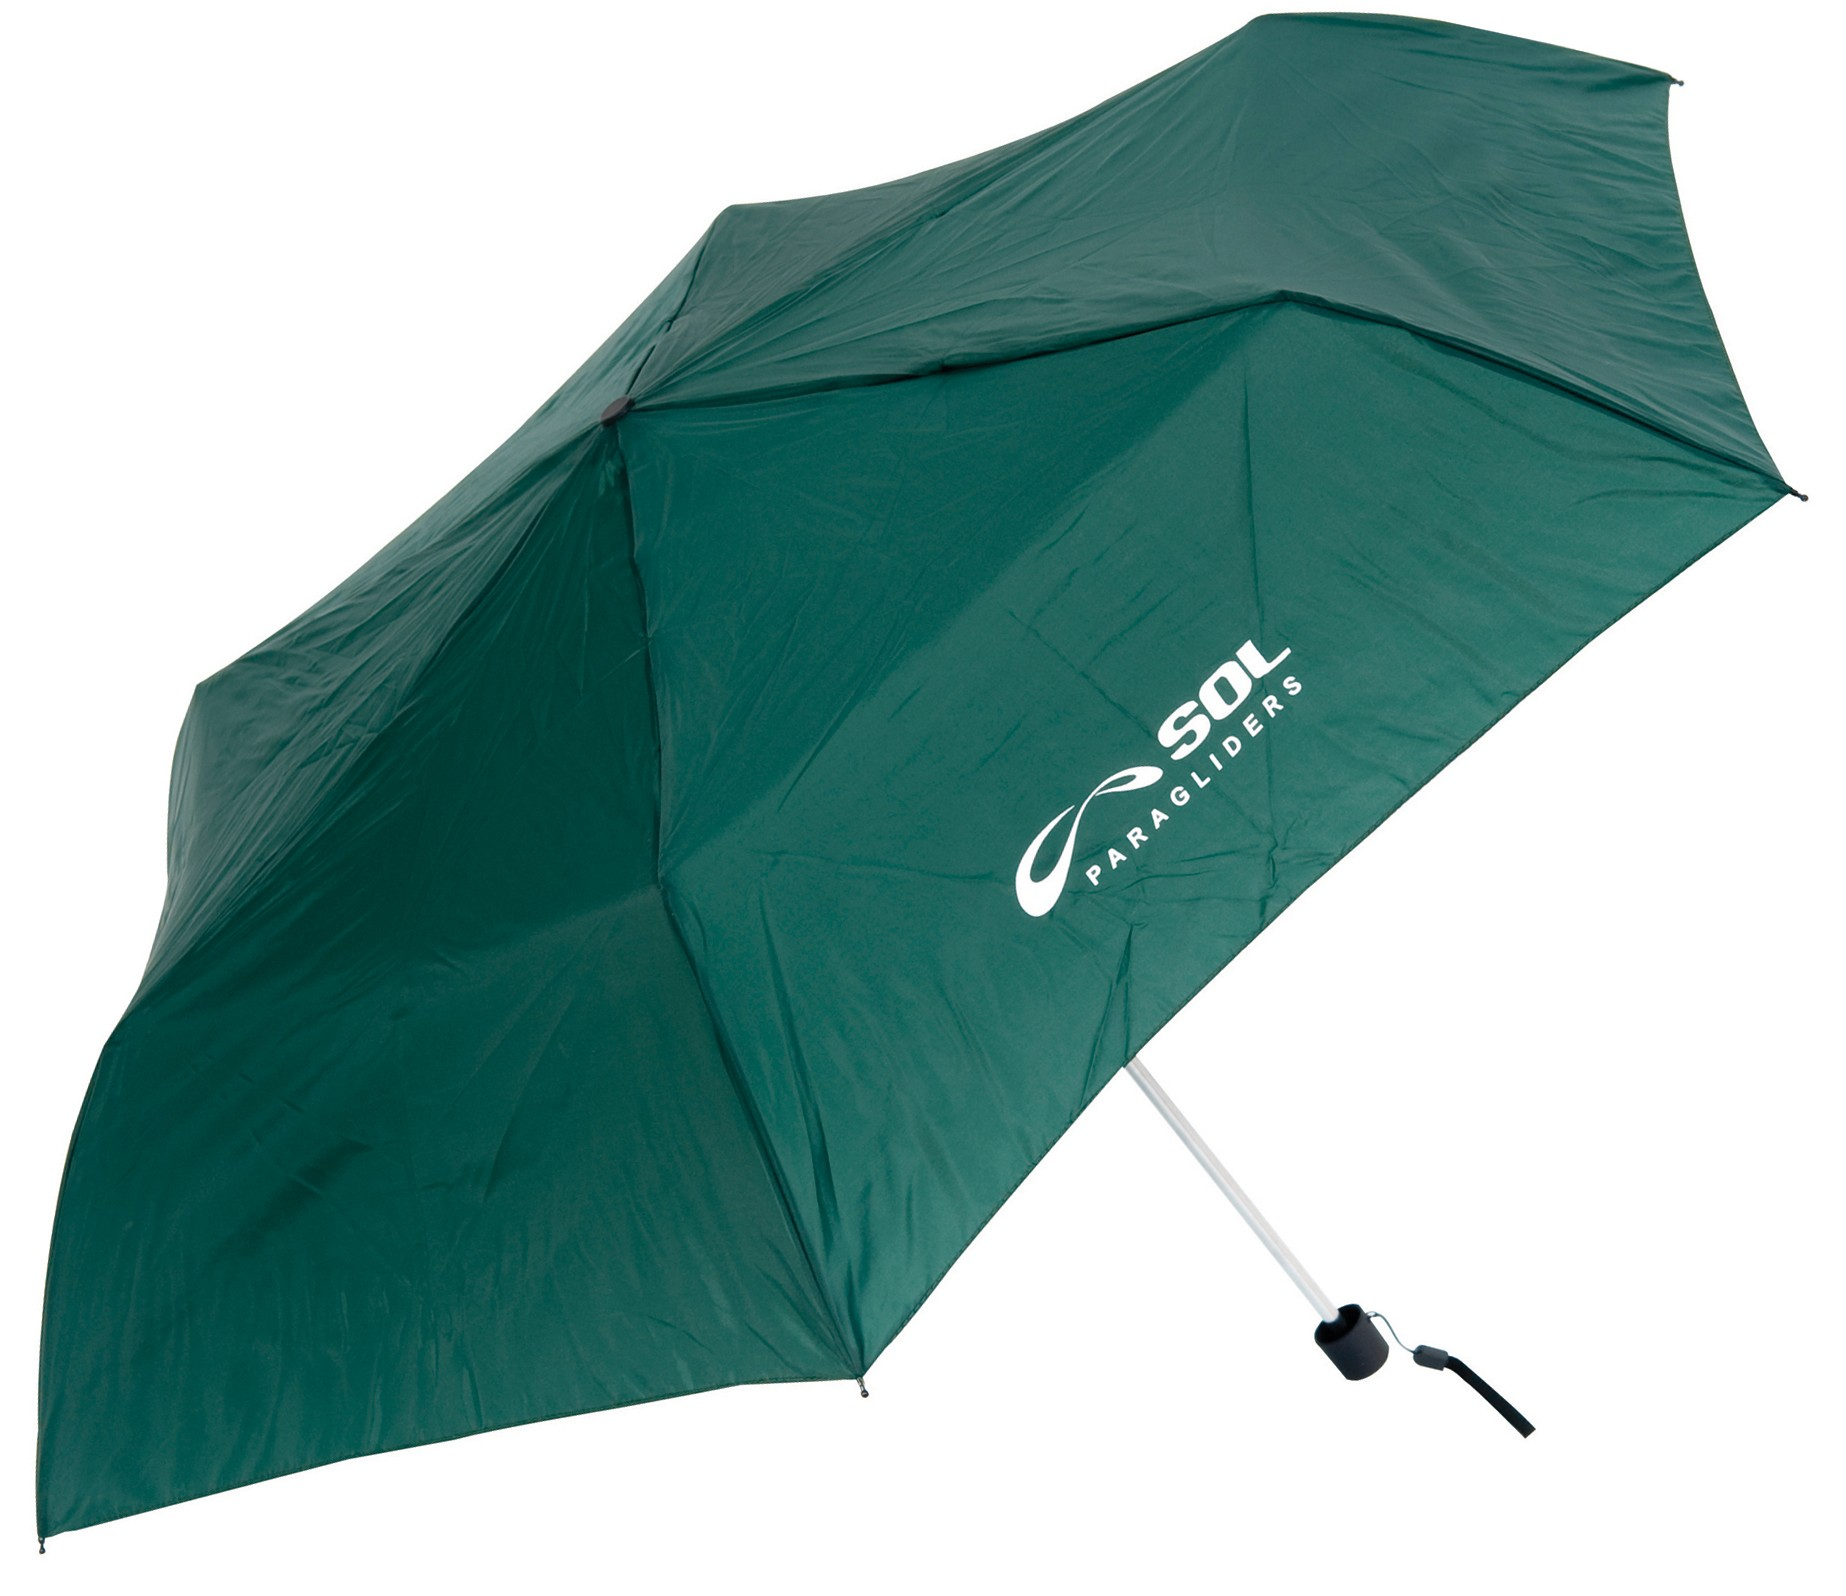 Printed Promotional Slimtel Umbrella